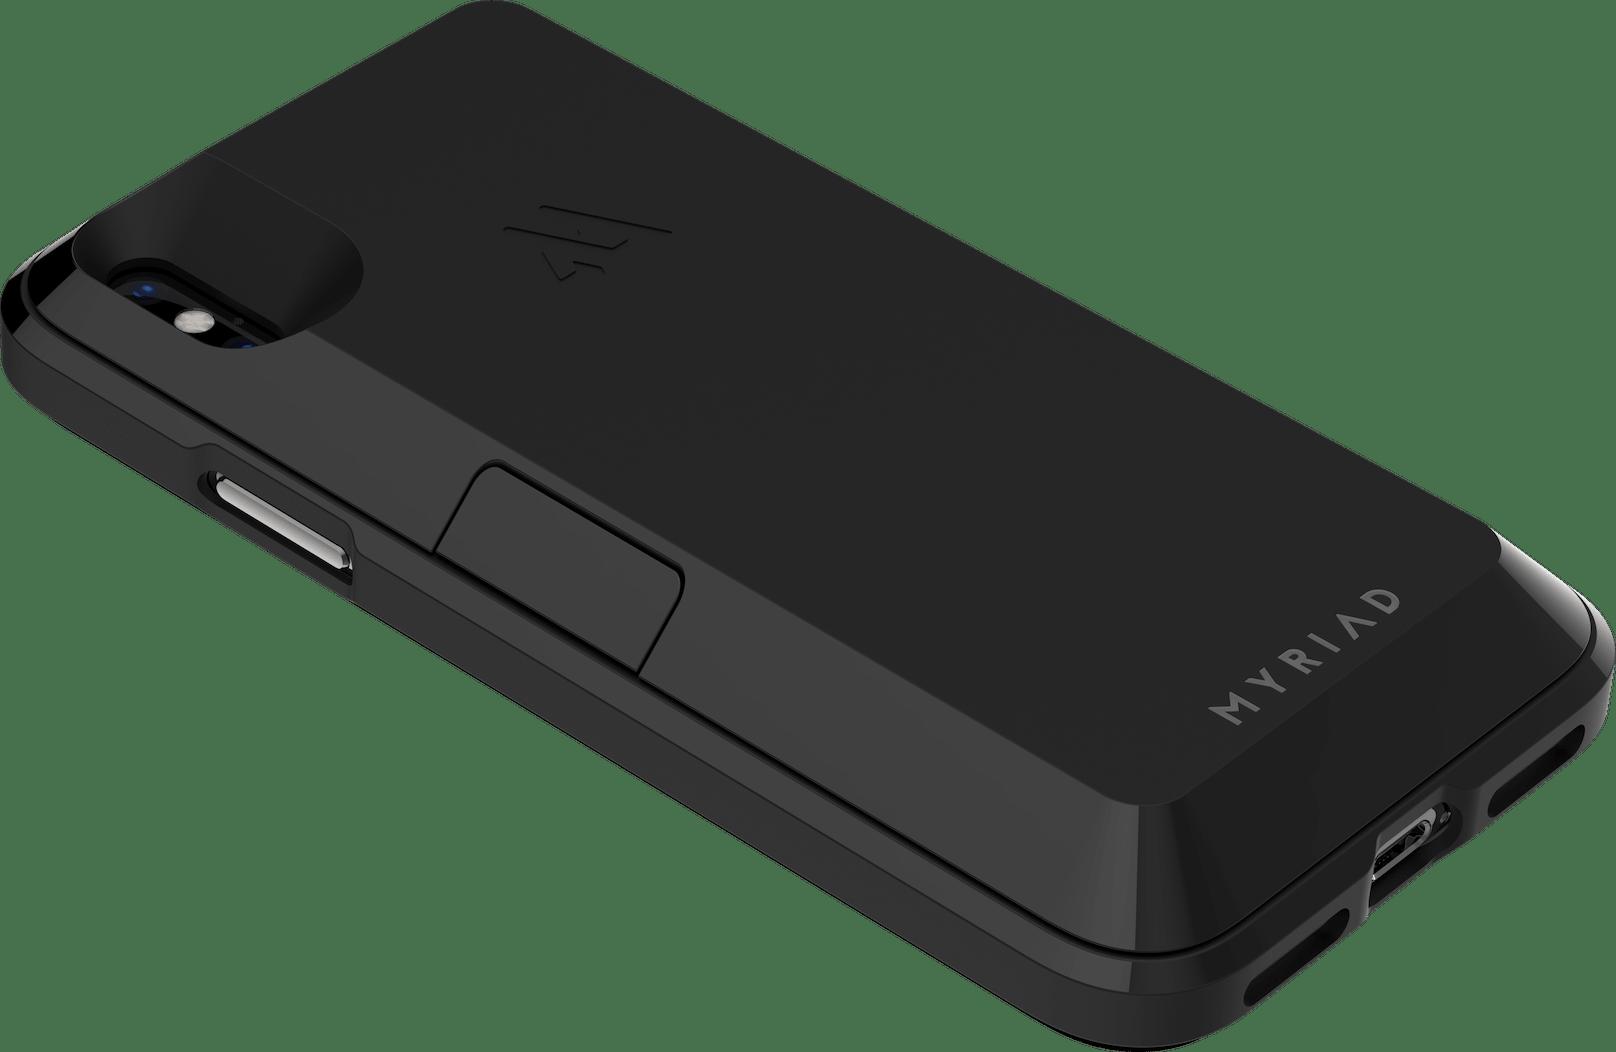 Quarter View of Myriad Case in Black